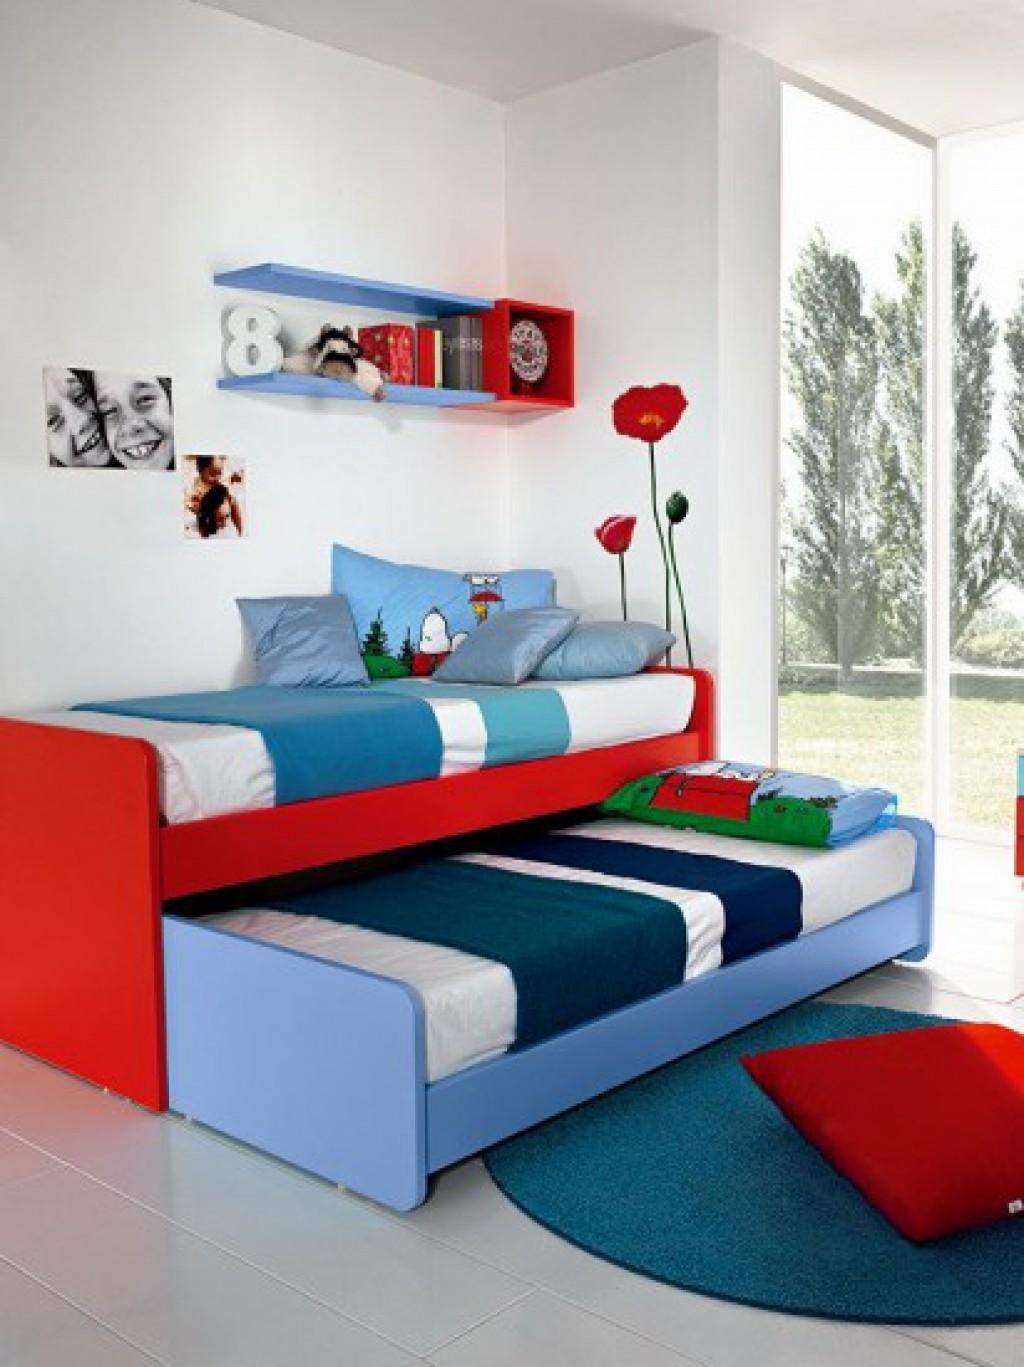 Cameretta moderna oc c112 cucine mobili di qualit al for Acero rosso milano